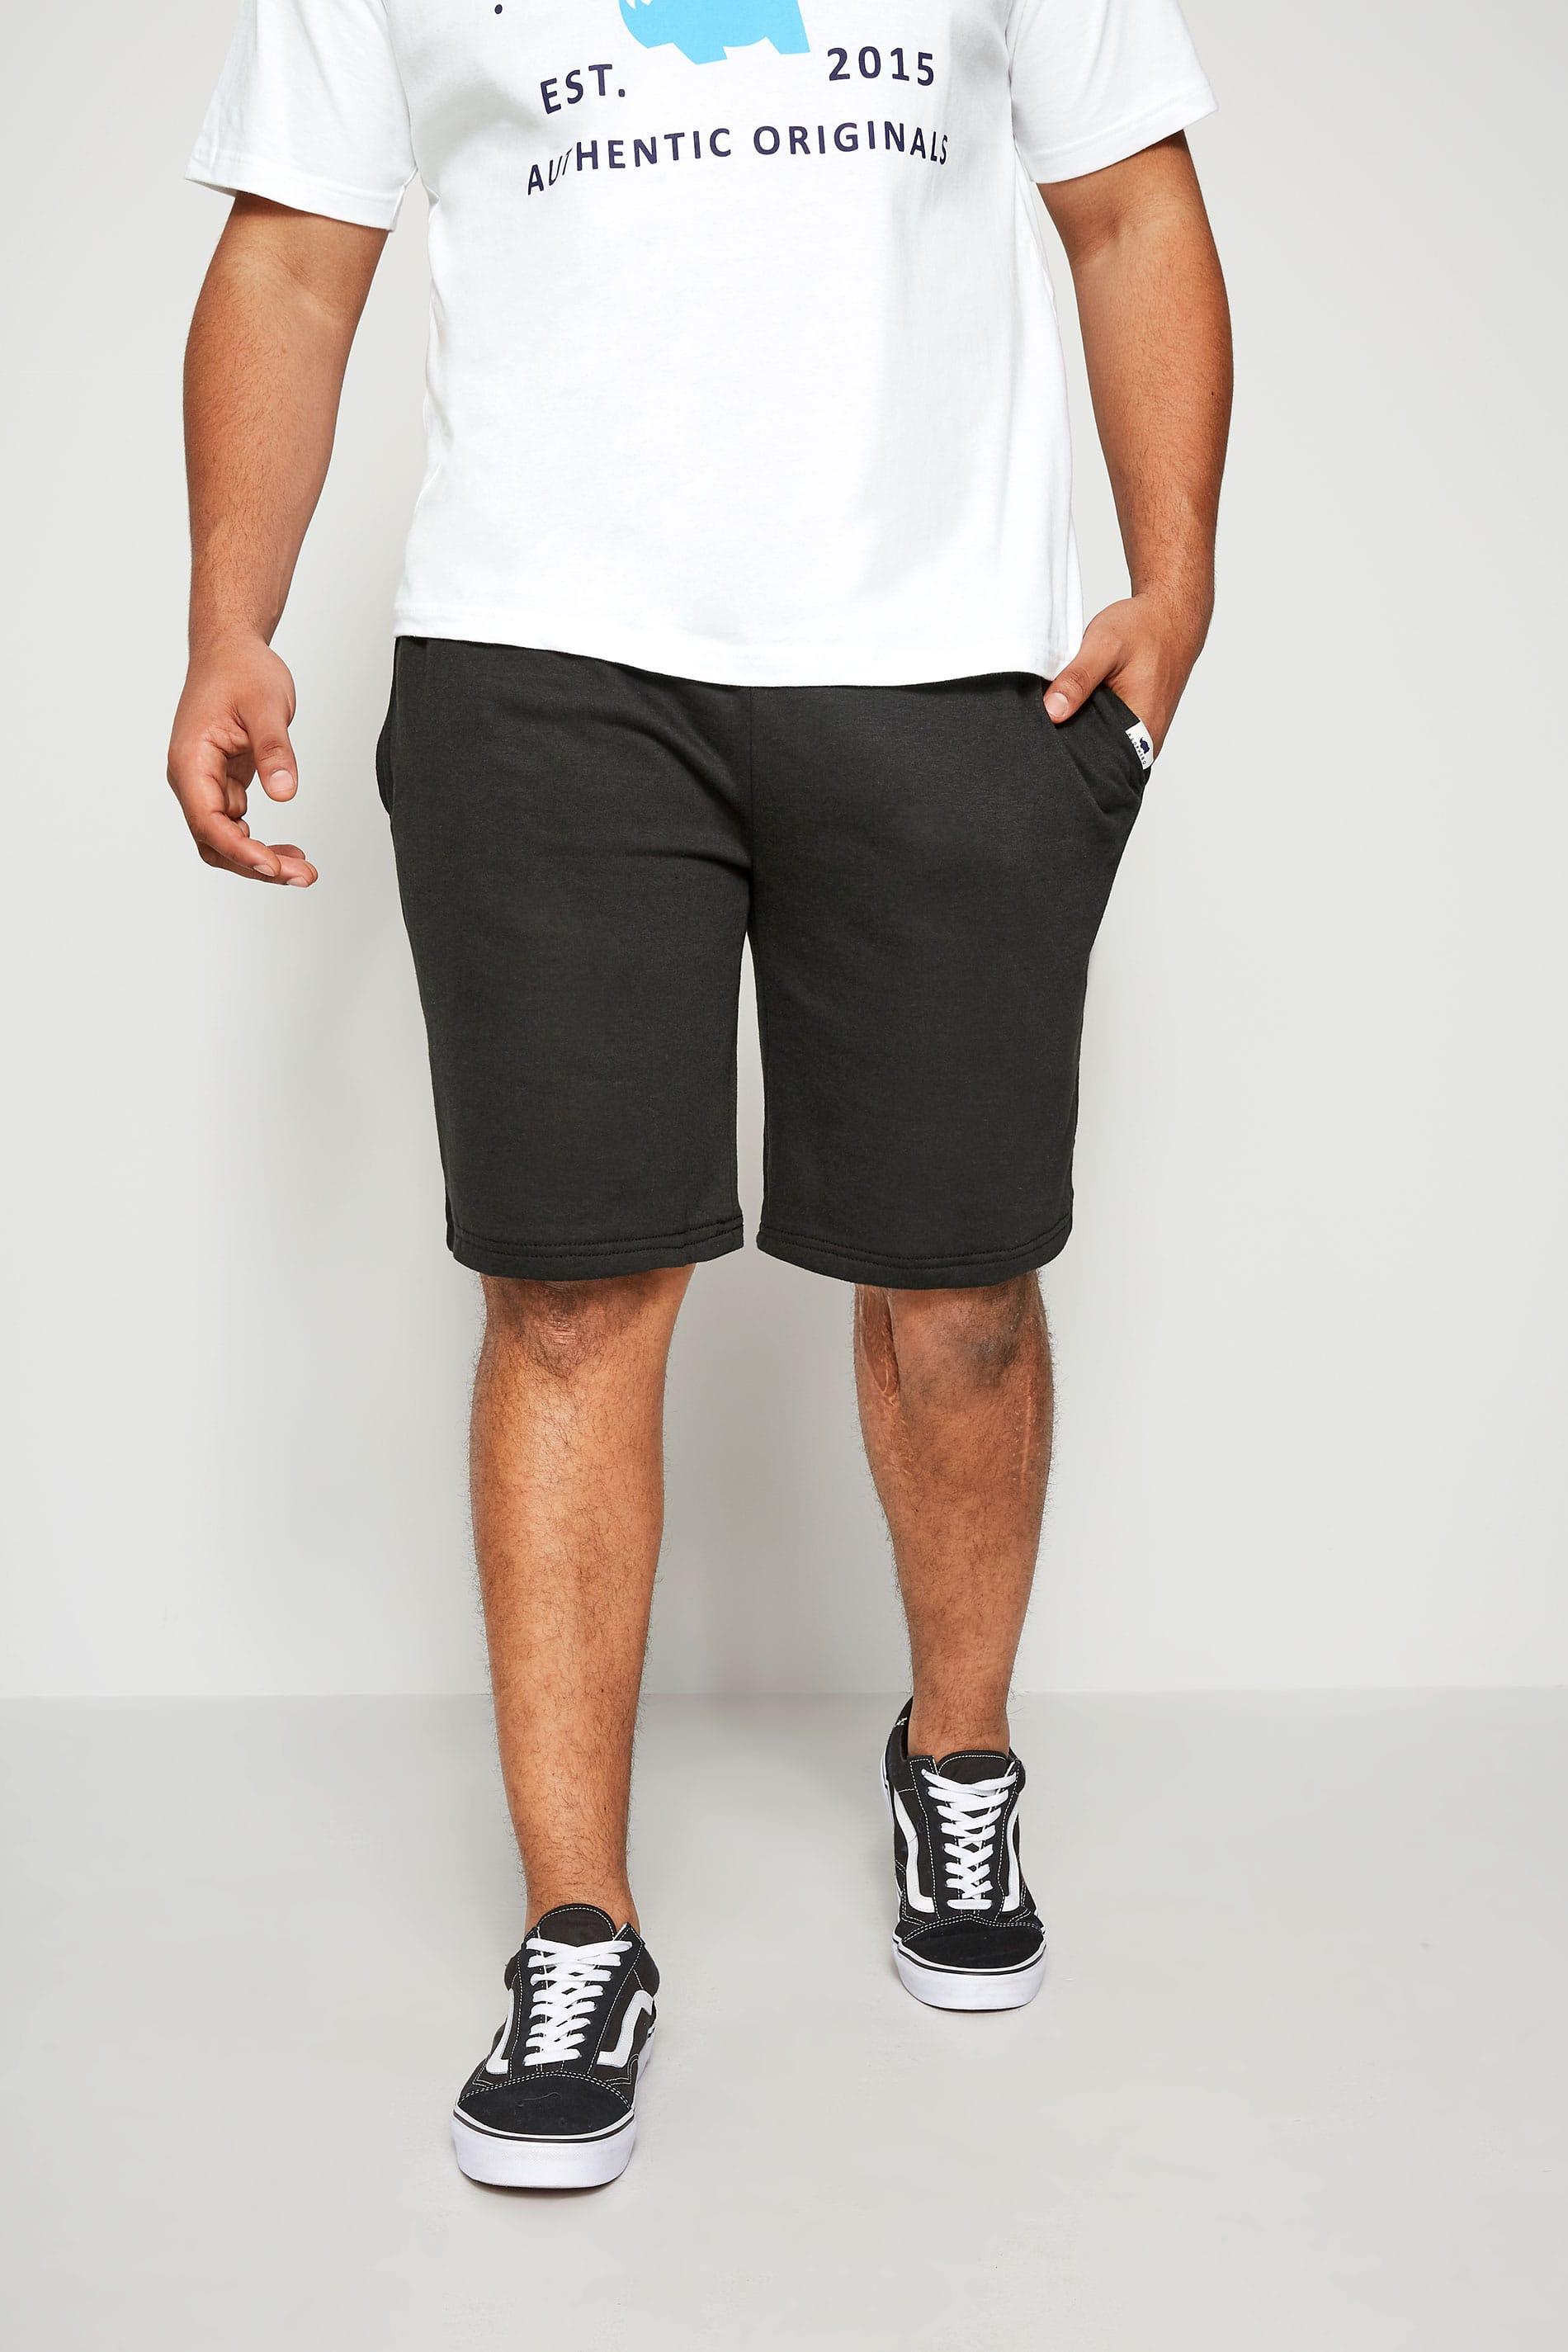 Badrhino Mens Basic Sweat Shorts With Pockets Extra Large Sizes L To 8xl